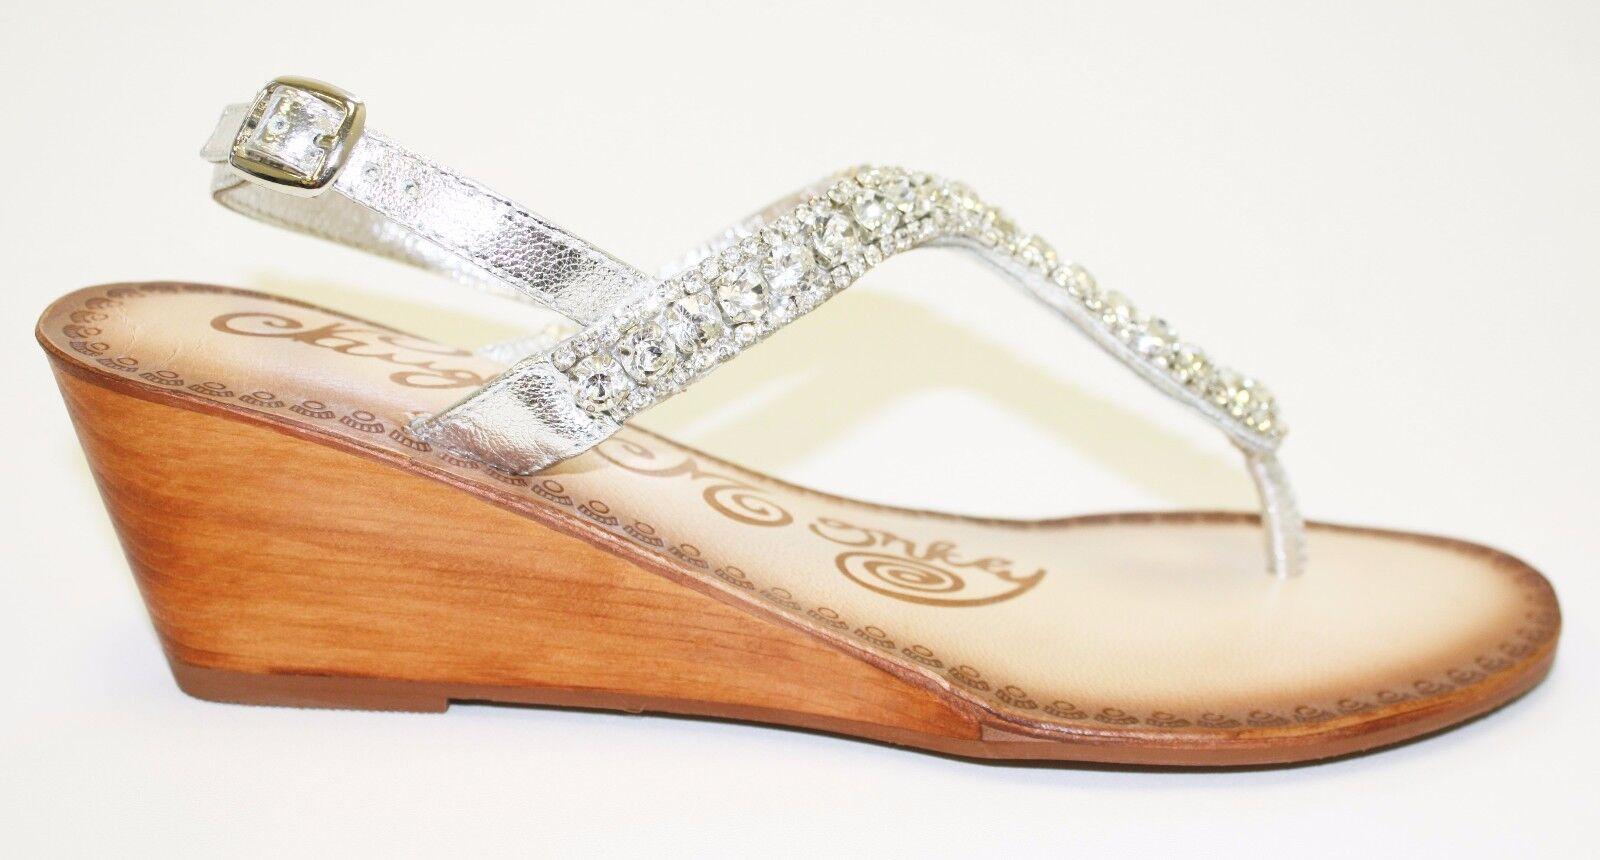 Para mujeres mujeres mujeres Zapatos Naughty Monkey lluvias Vestido Cuña Sandalias Plata Bling  garantía de crédito